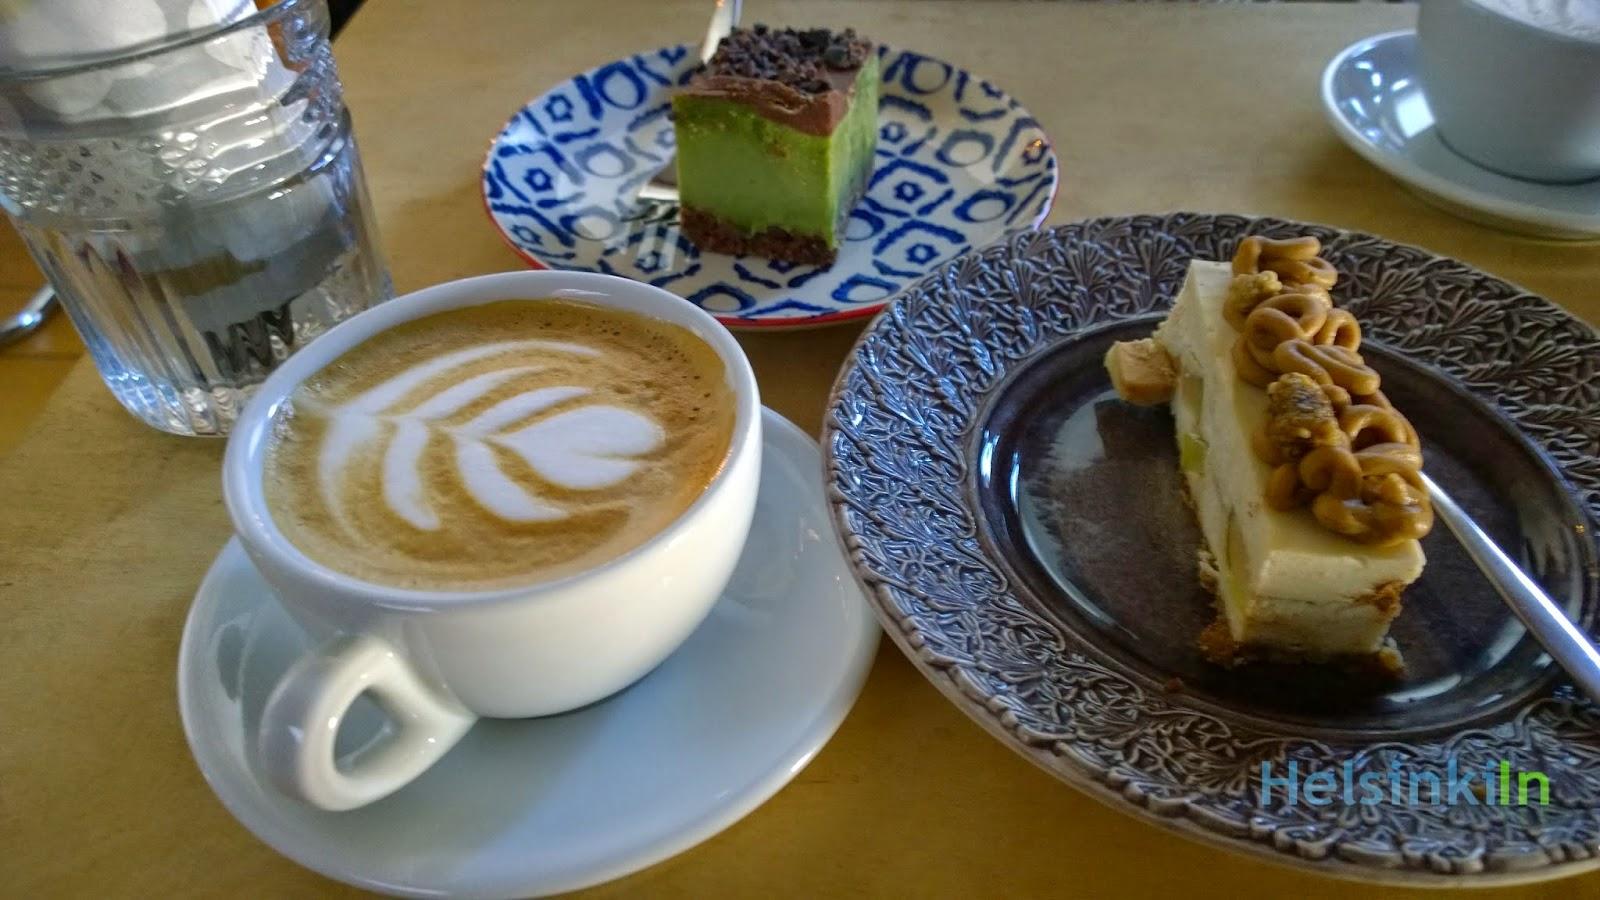 coffee break at Café Kokko